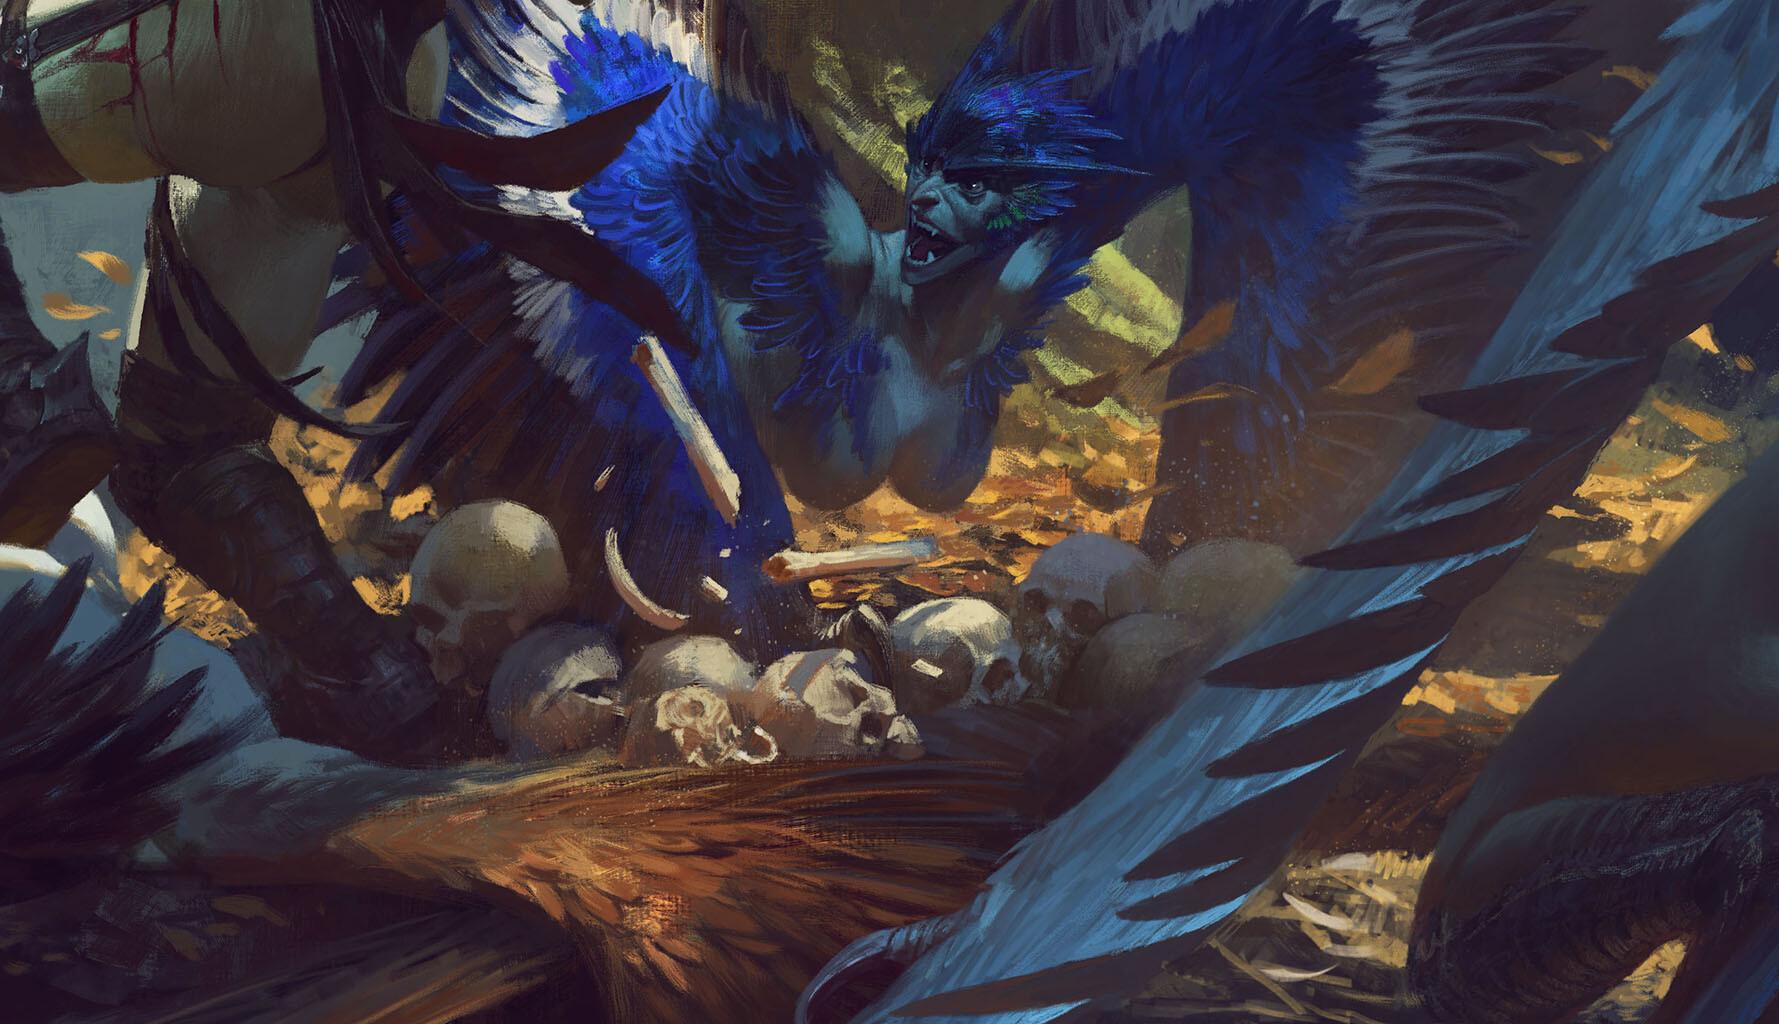 Bayard wu fighting in the harpy nest p04